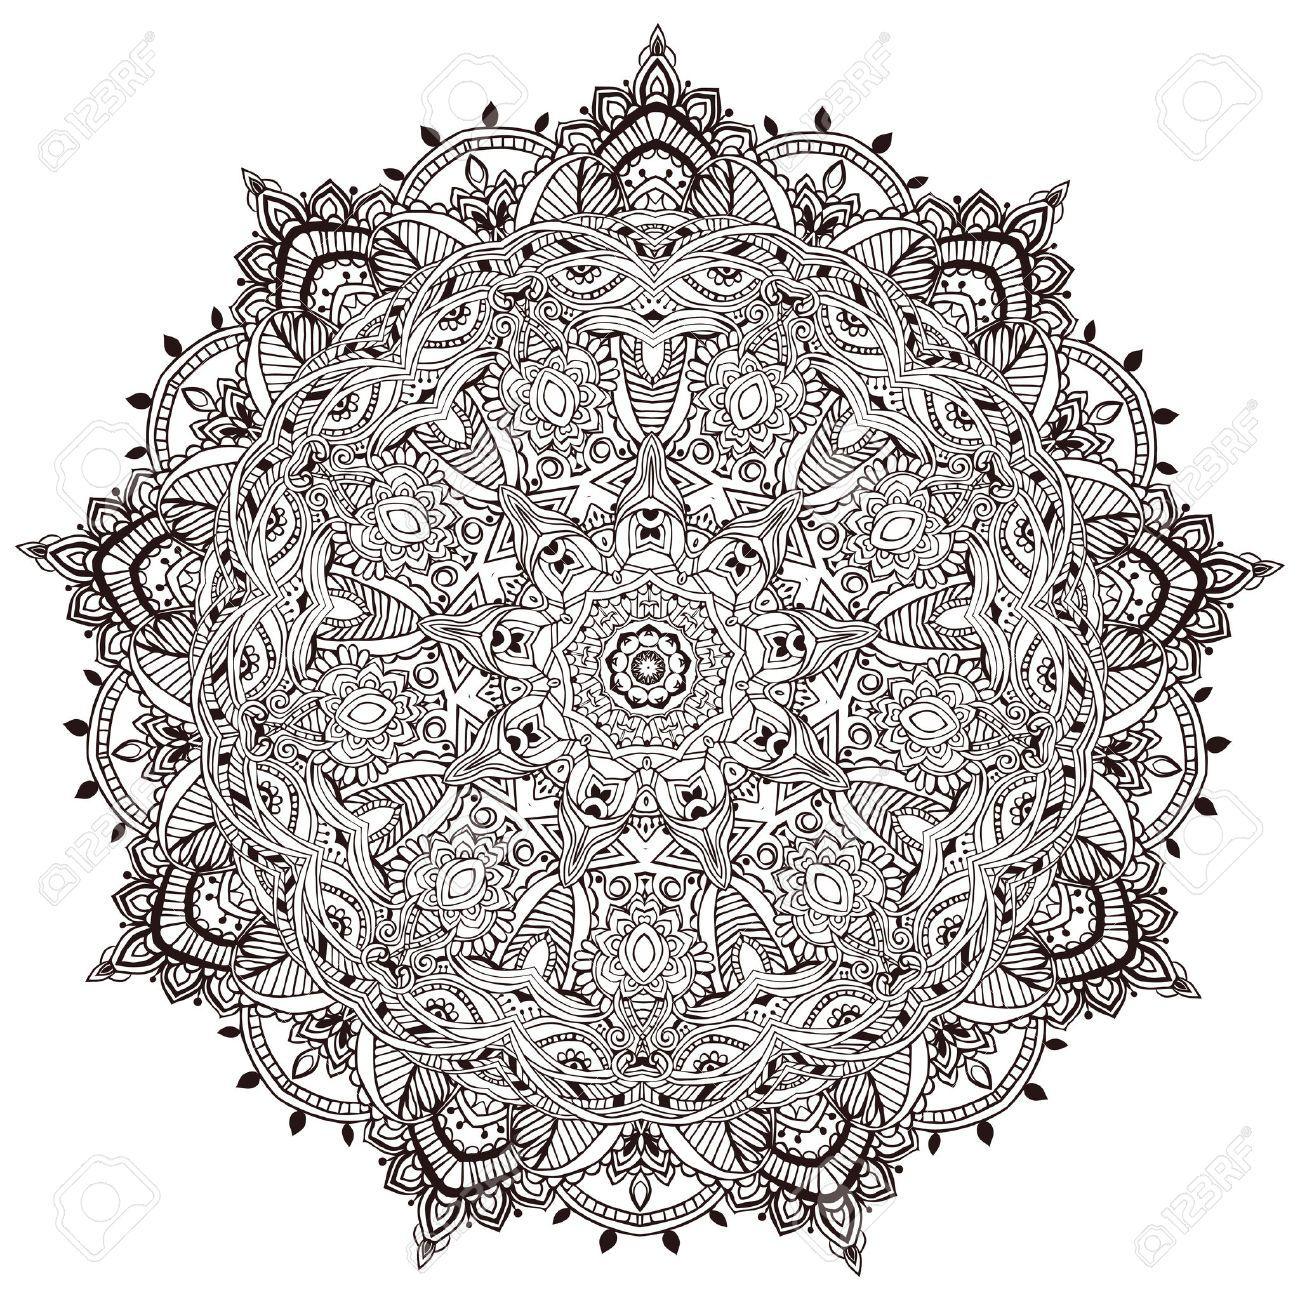 Ornament Black White Card With Mandala Geometric Circle Element Royalty Free Cliparts Vectors Mandala Coloring Mandala Coloring Pages Mandala Coloring Books